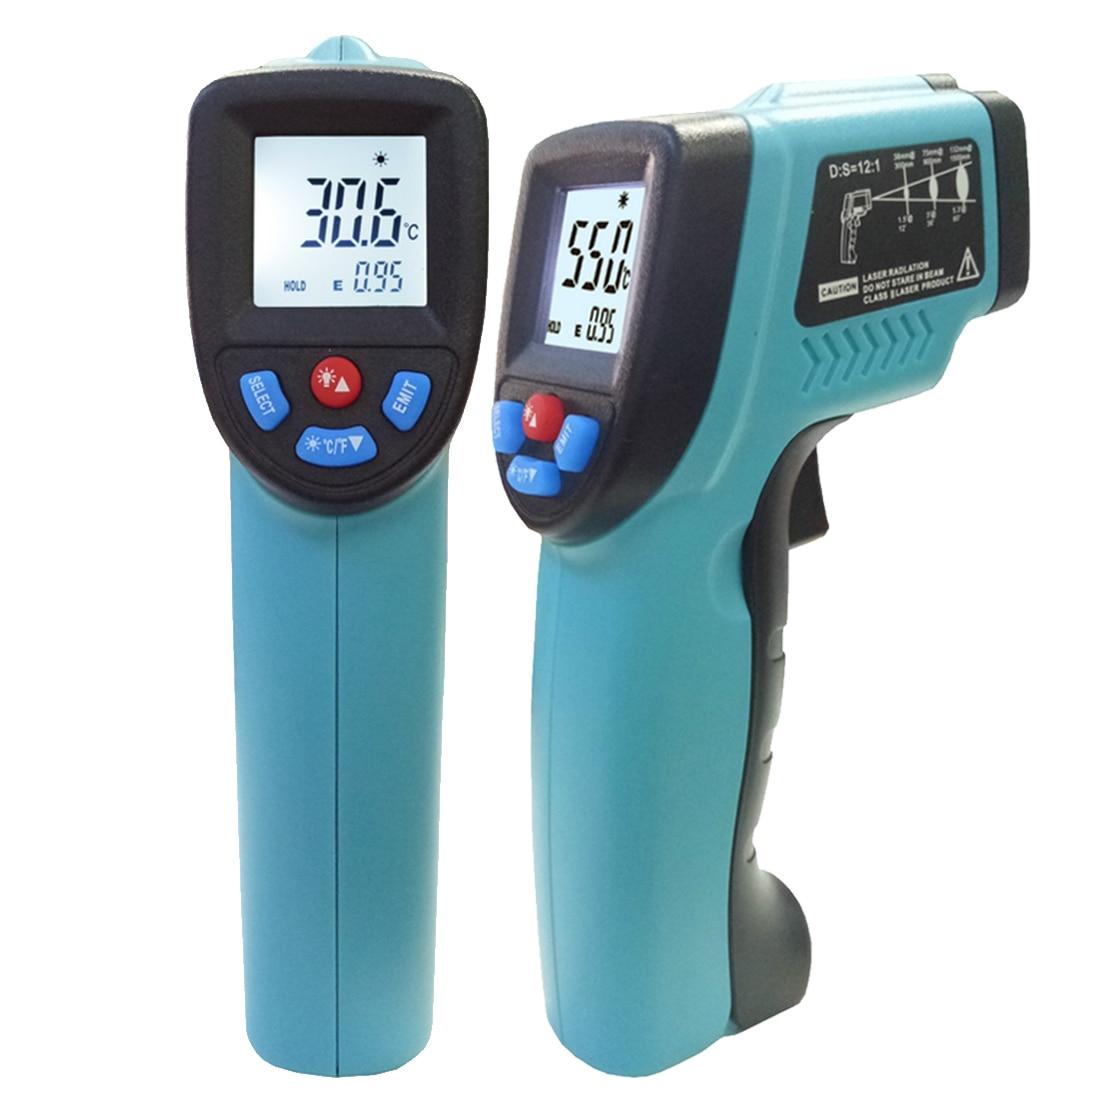 GM550 -50~550 C Digital infrared Thermometer Pyrometer Aquarium laser Thermometer Outdoor thermometer